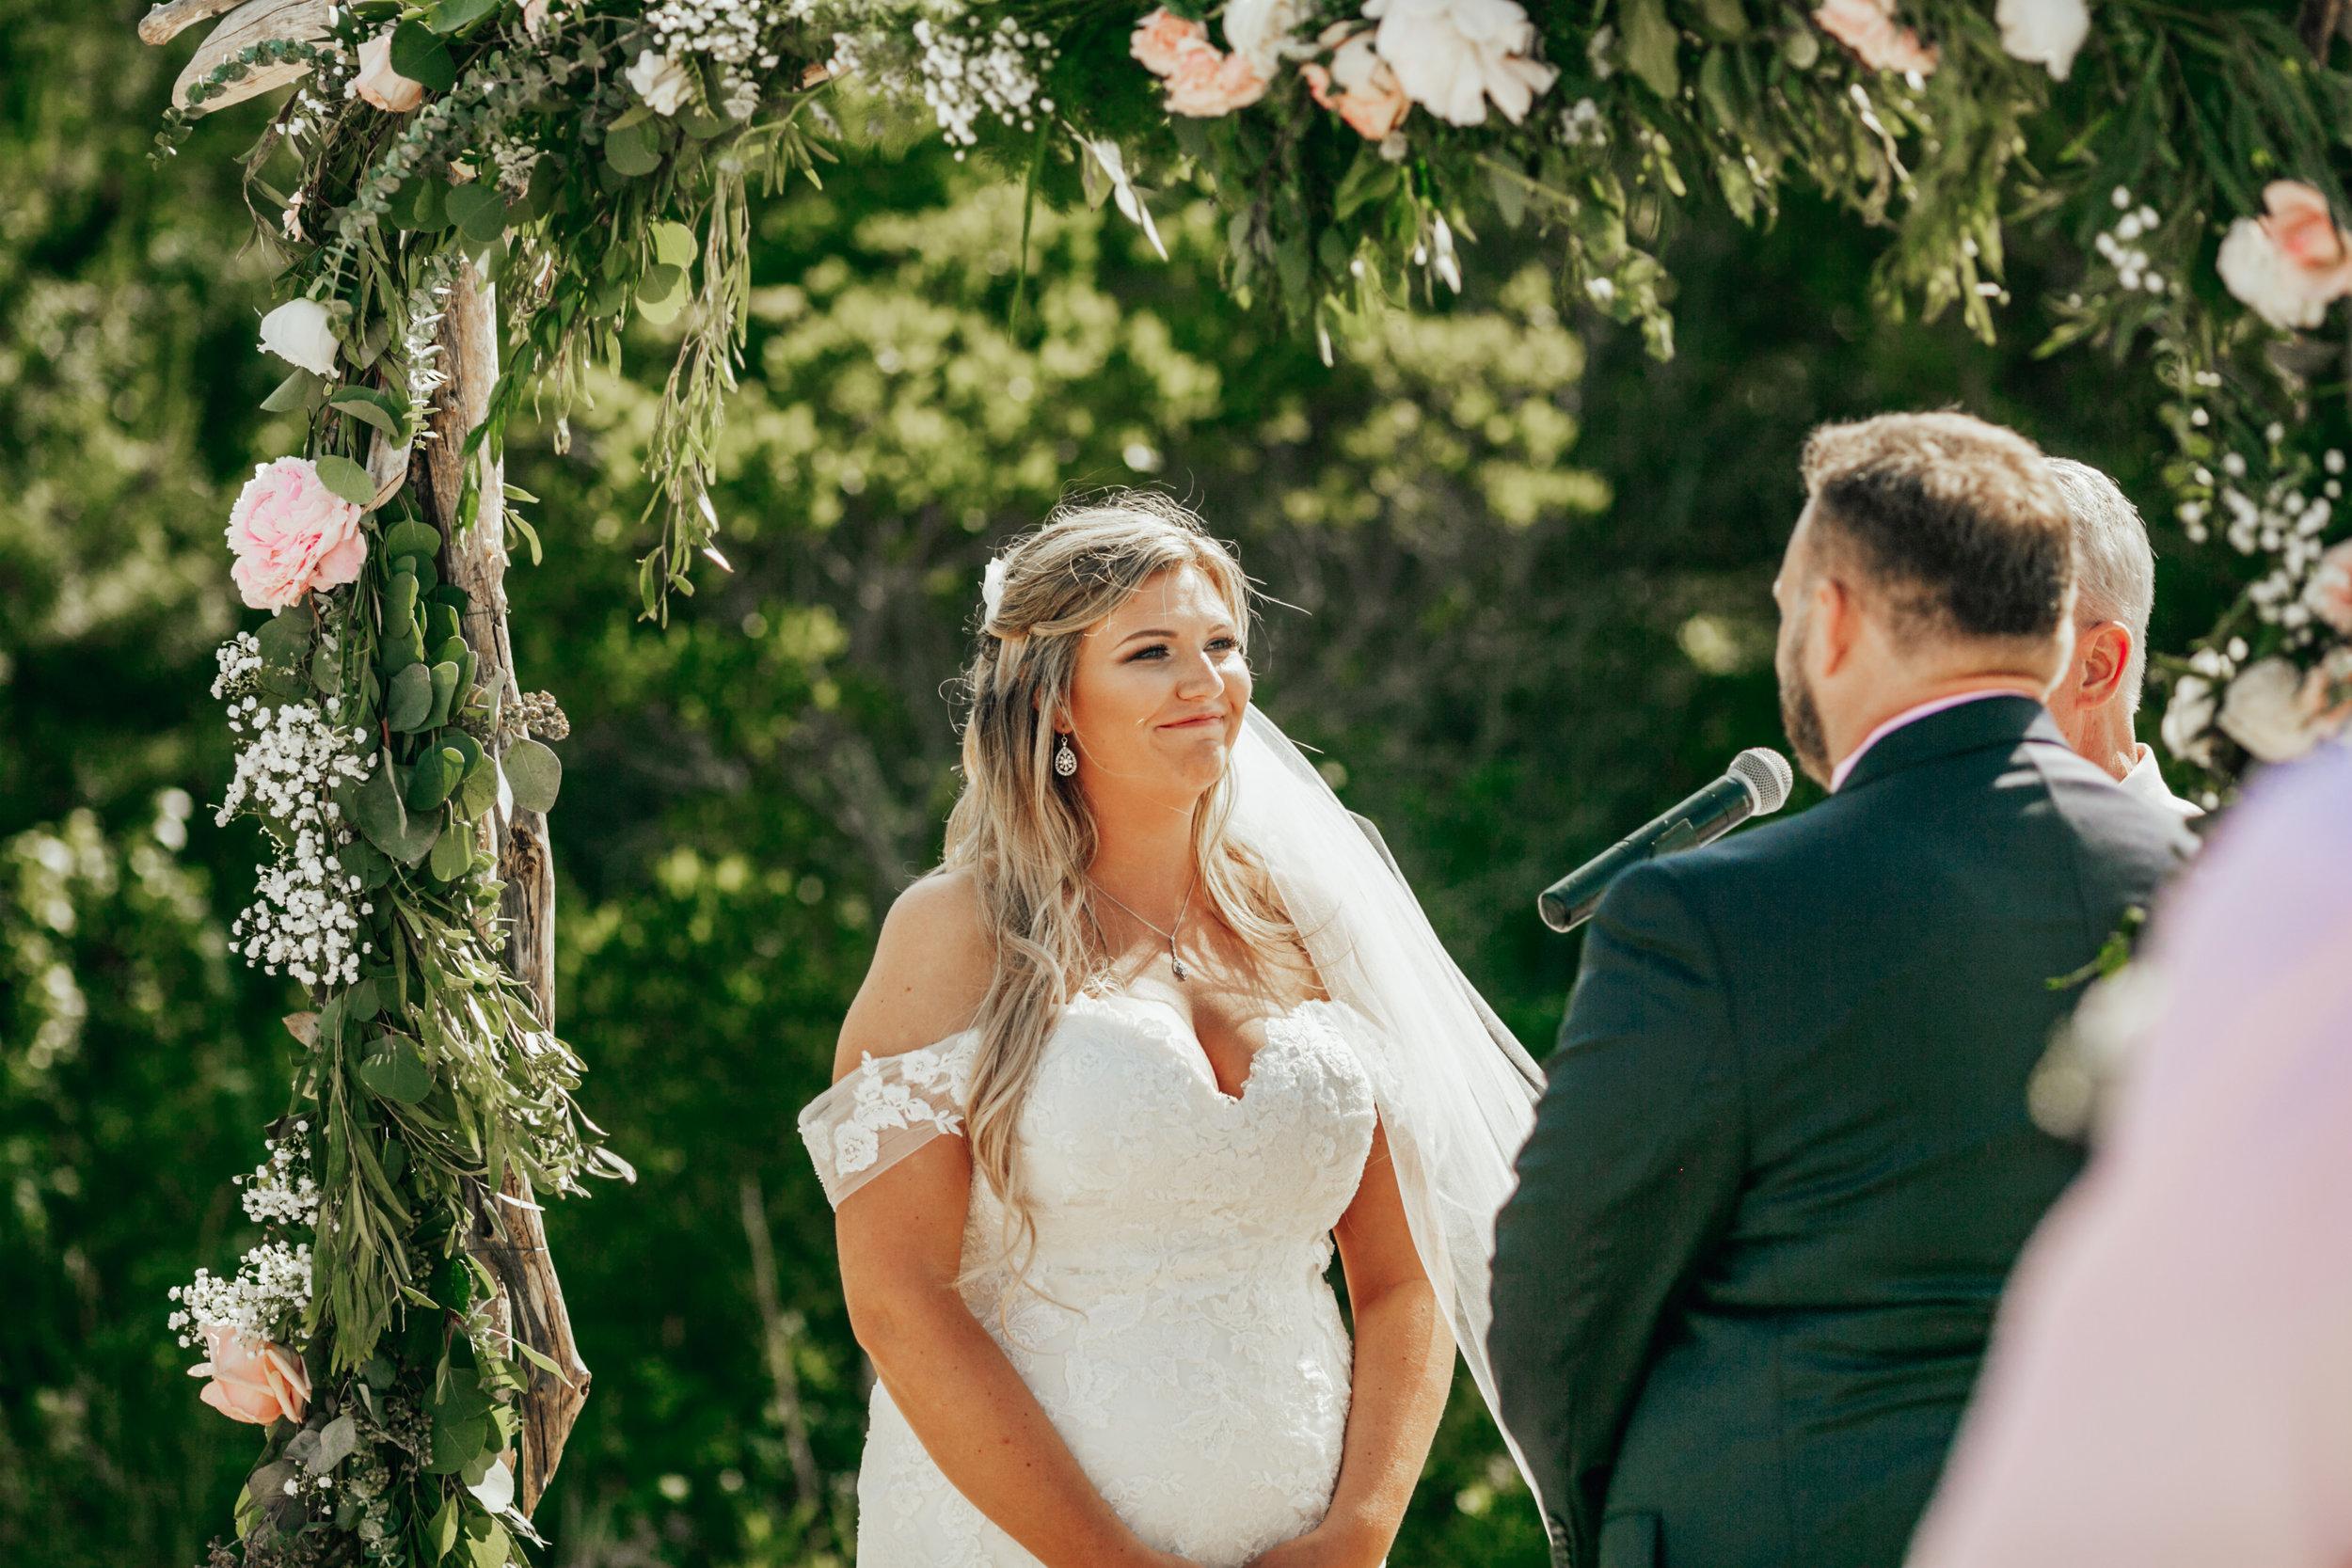 New Jersey Wedding Photographer, Felsberg Photography LBI wedding photography 66.jpg